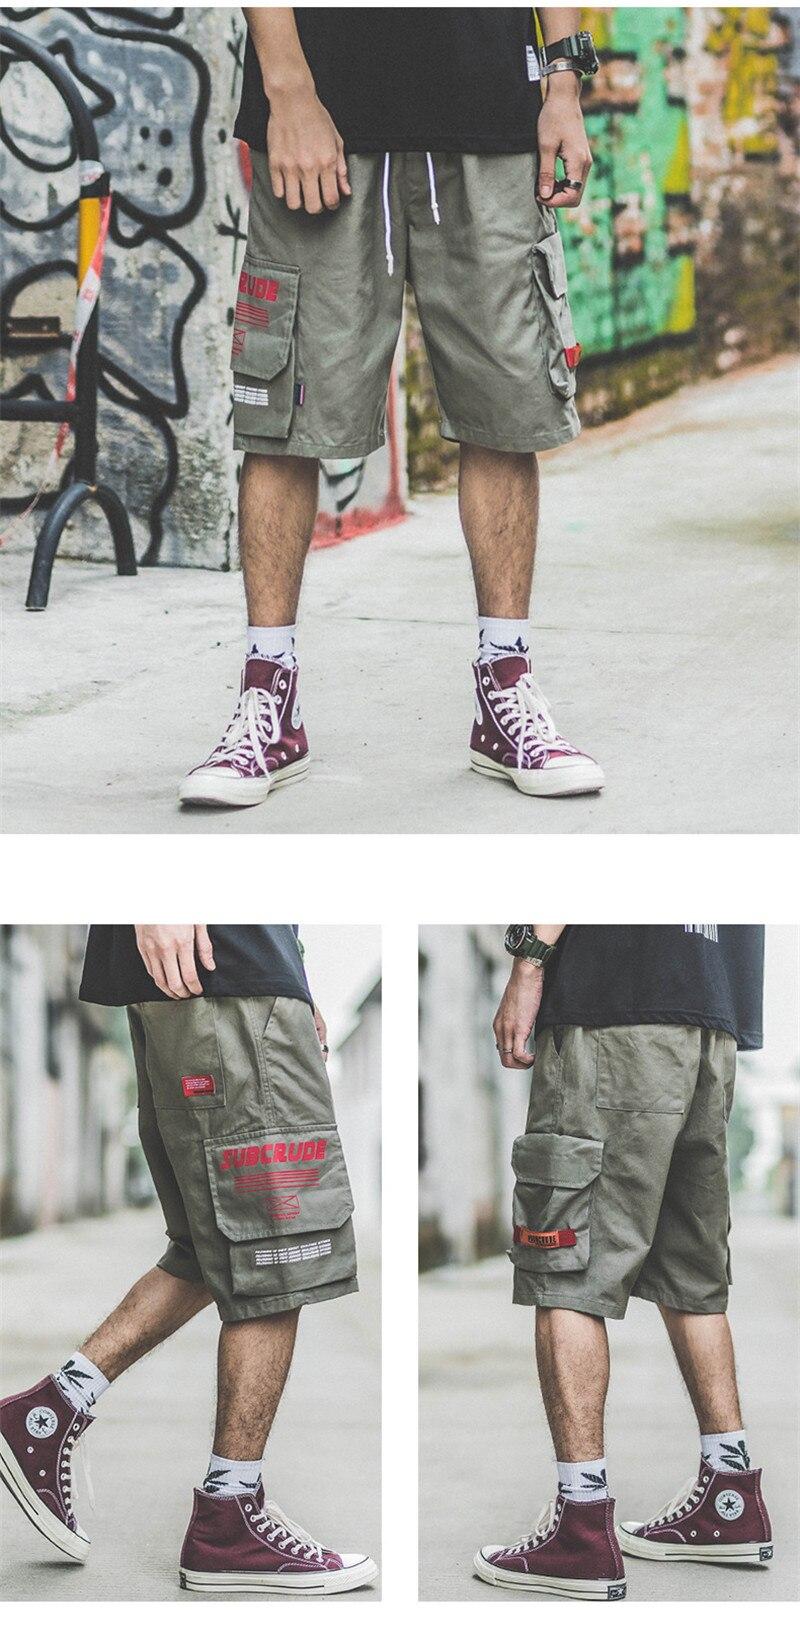 Japanese Harajuku Big Pockets Mens Cargo Shorts for Summer Urban Boys Streetwear Drawstring Hip Hop Short Pants Plus Size M-XXL 11